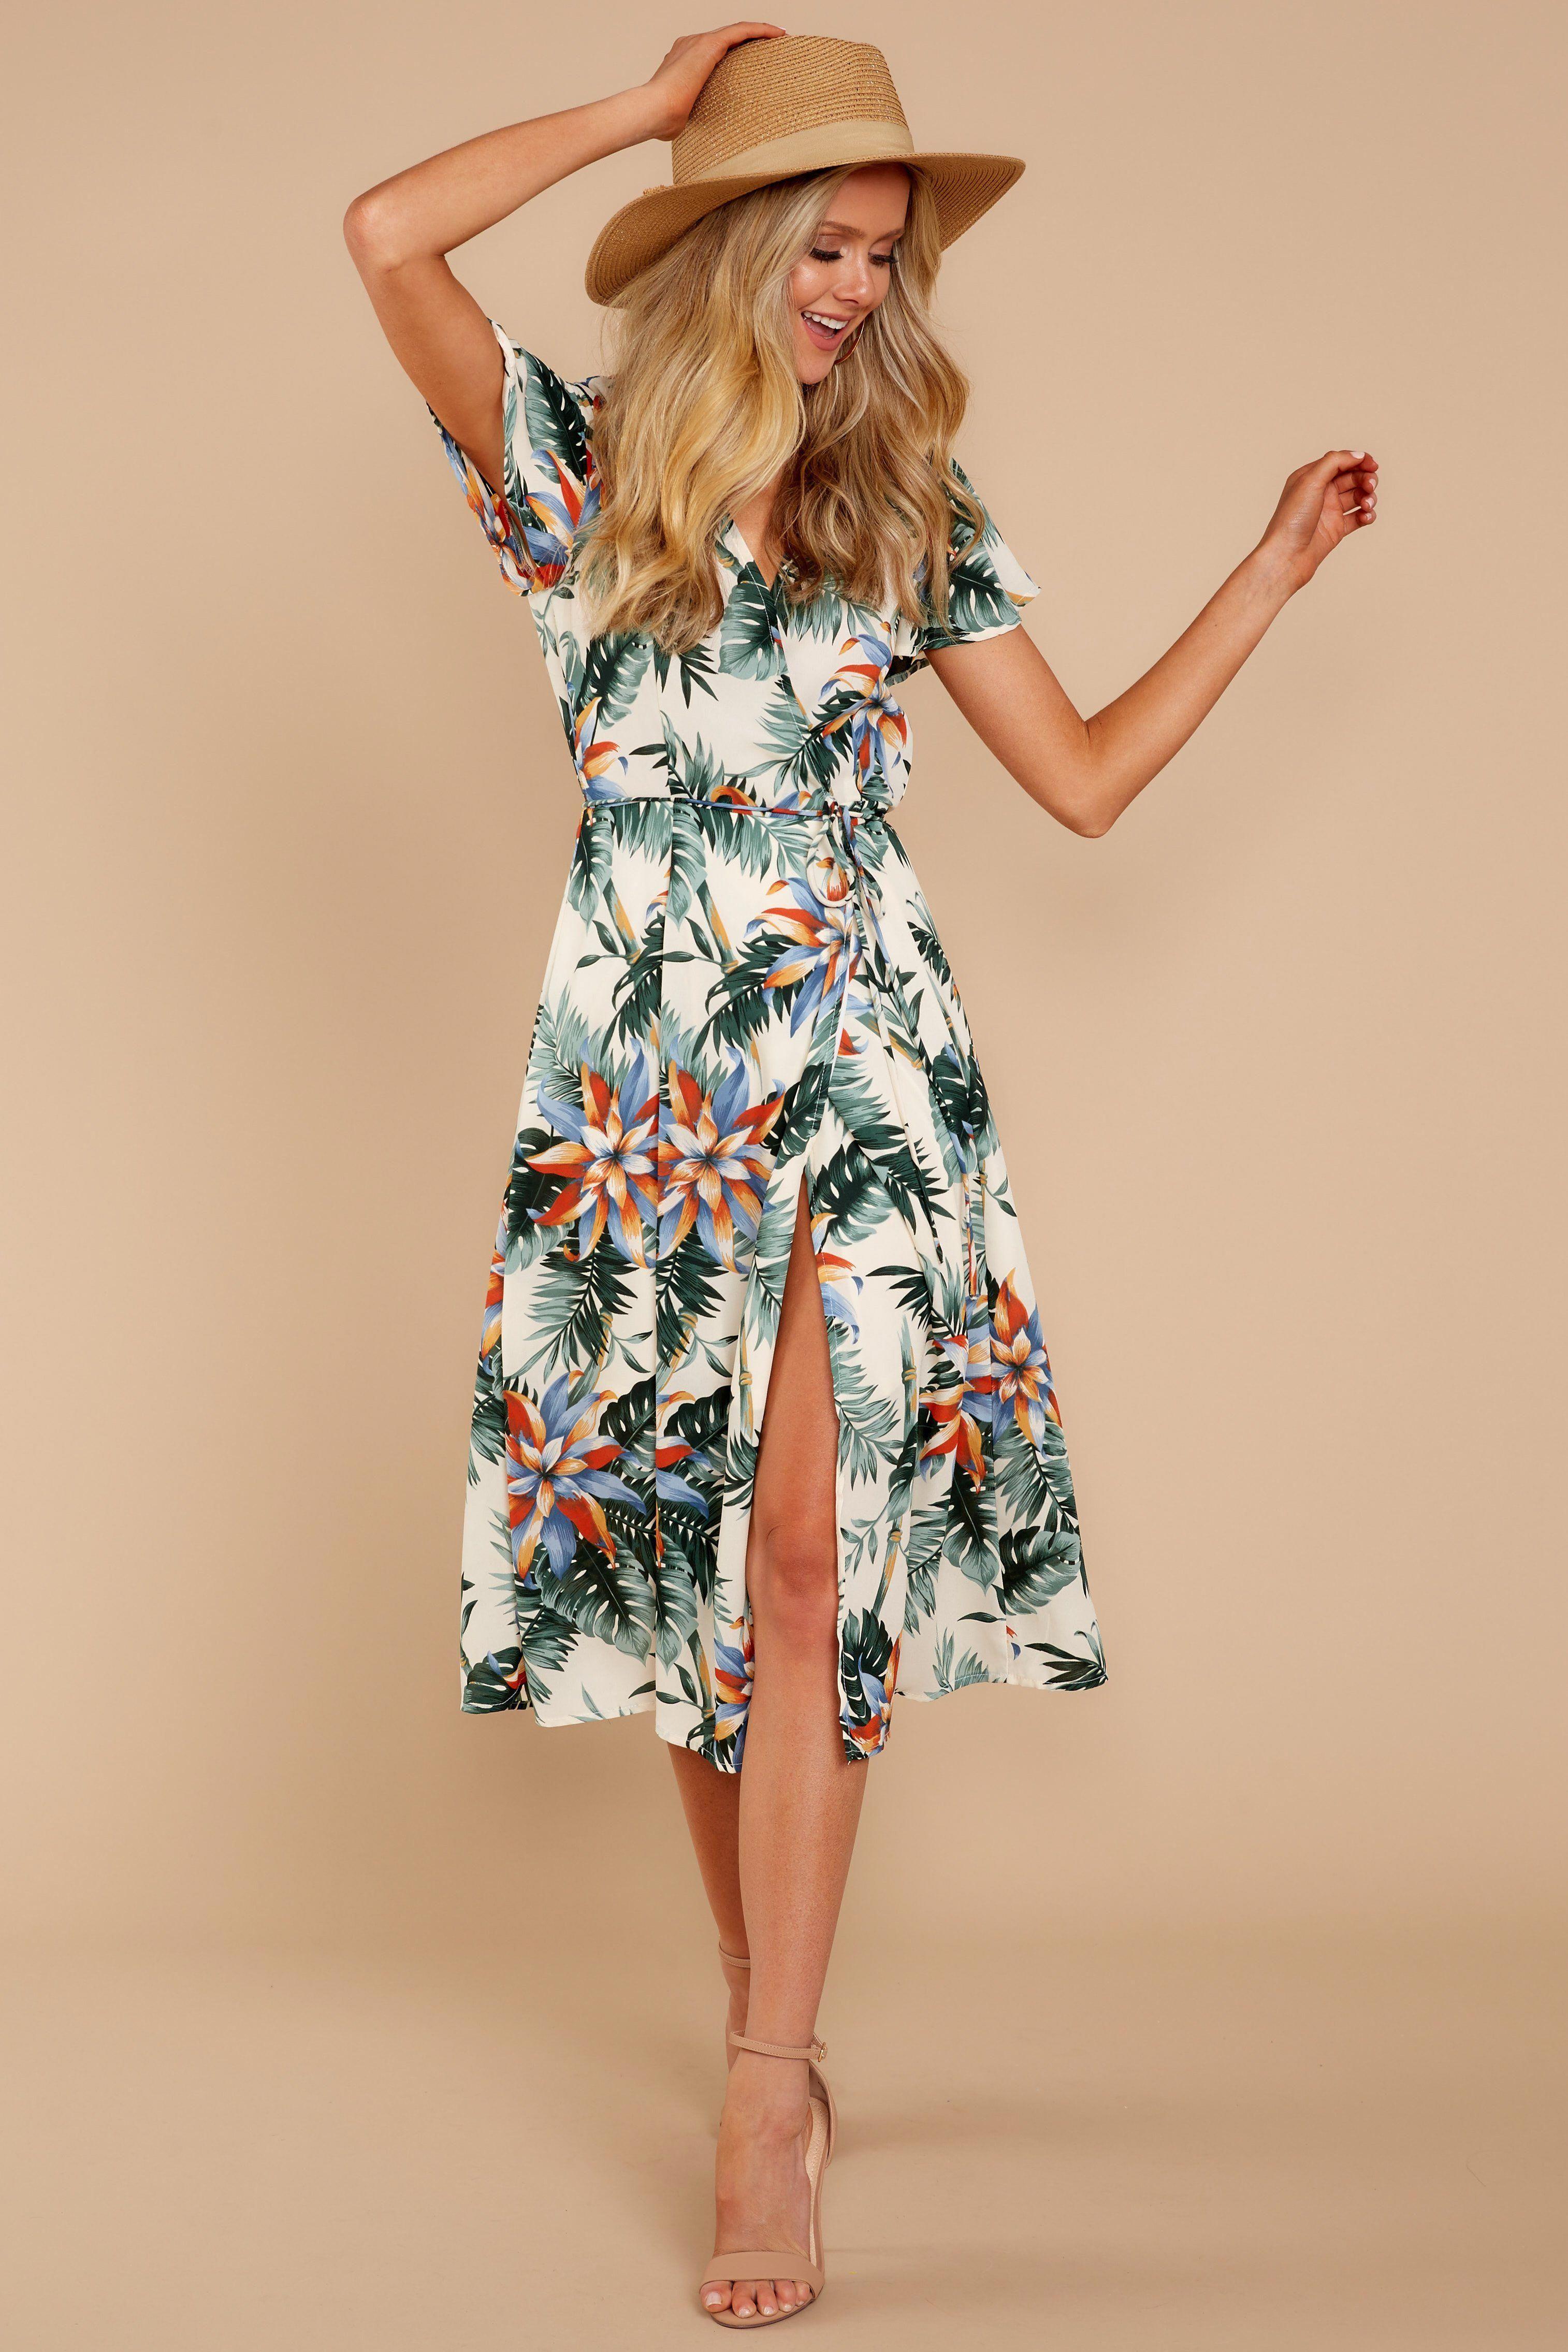 Pin By Meme Nukutabu On Summer Dresses Tropical Maxi Dress Tropical Dress Outfit Trendy Maxi Dresses [ 4542 x 3028 Pixel ]